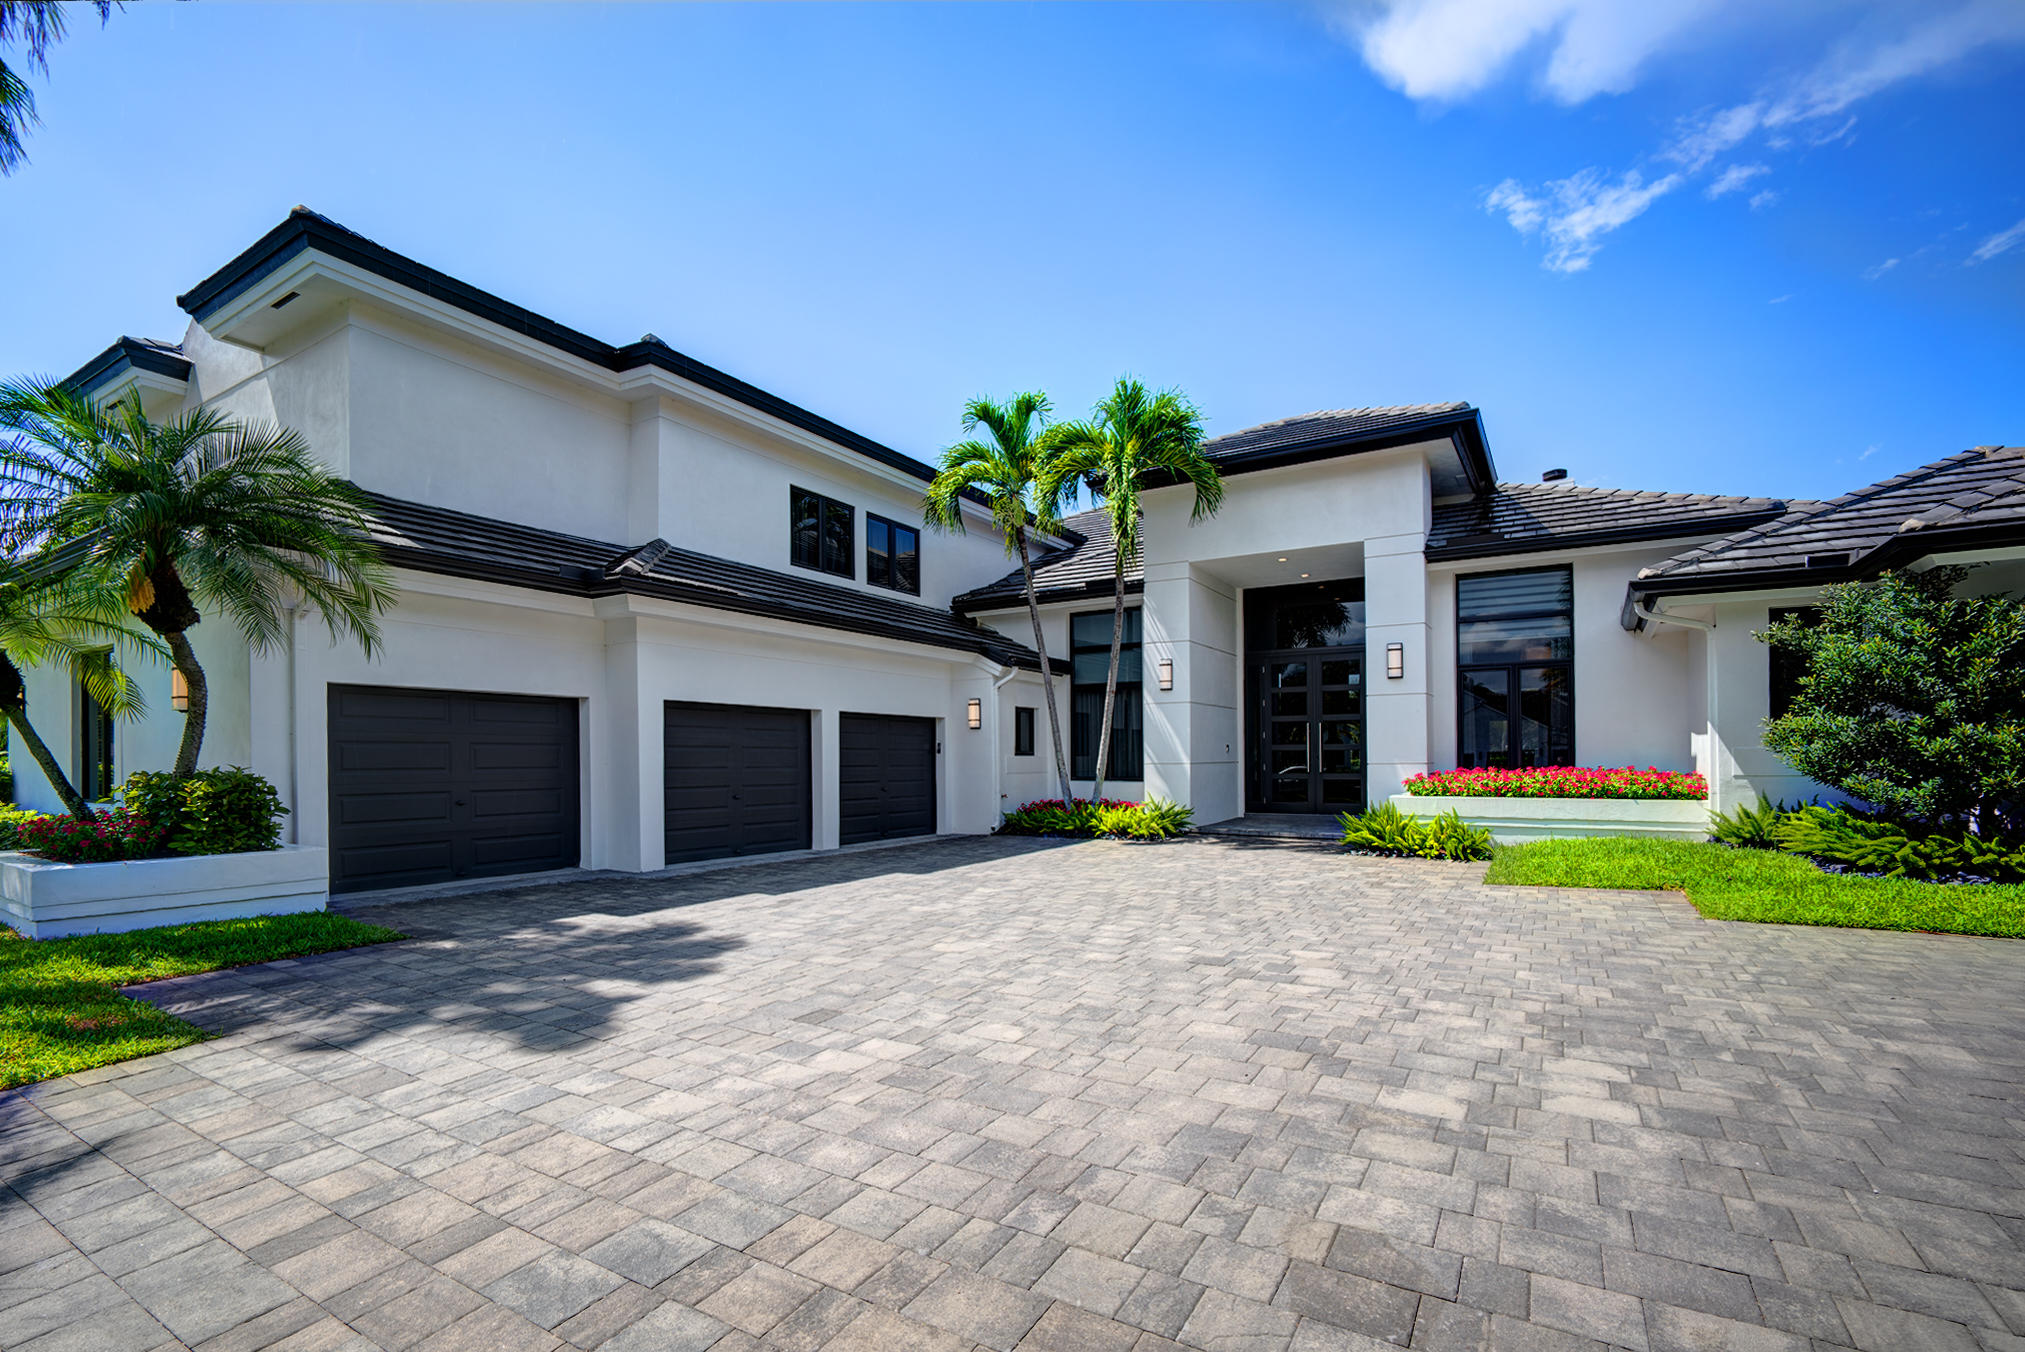 Photo of 3819 NW 53rd Street, Boca Raton, FL 33496